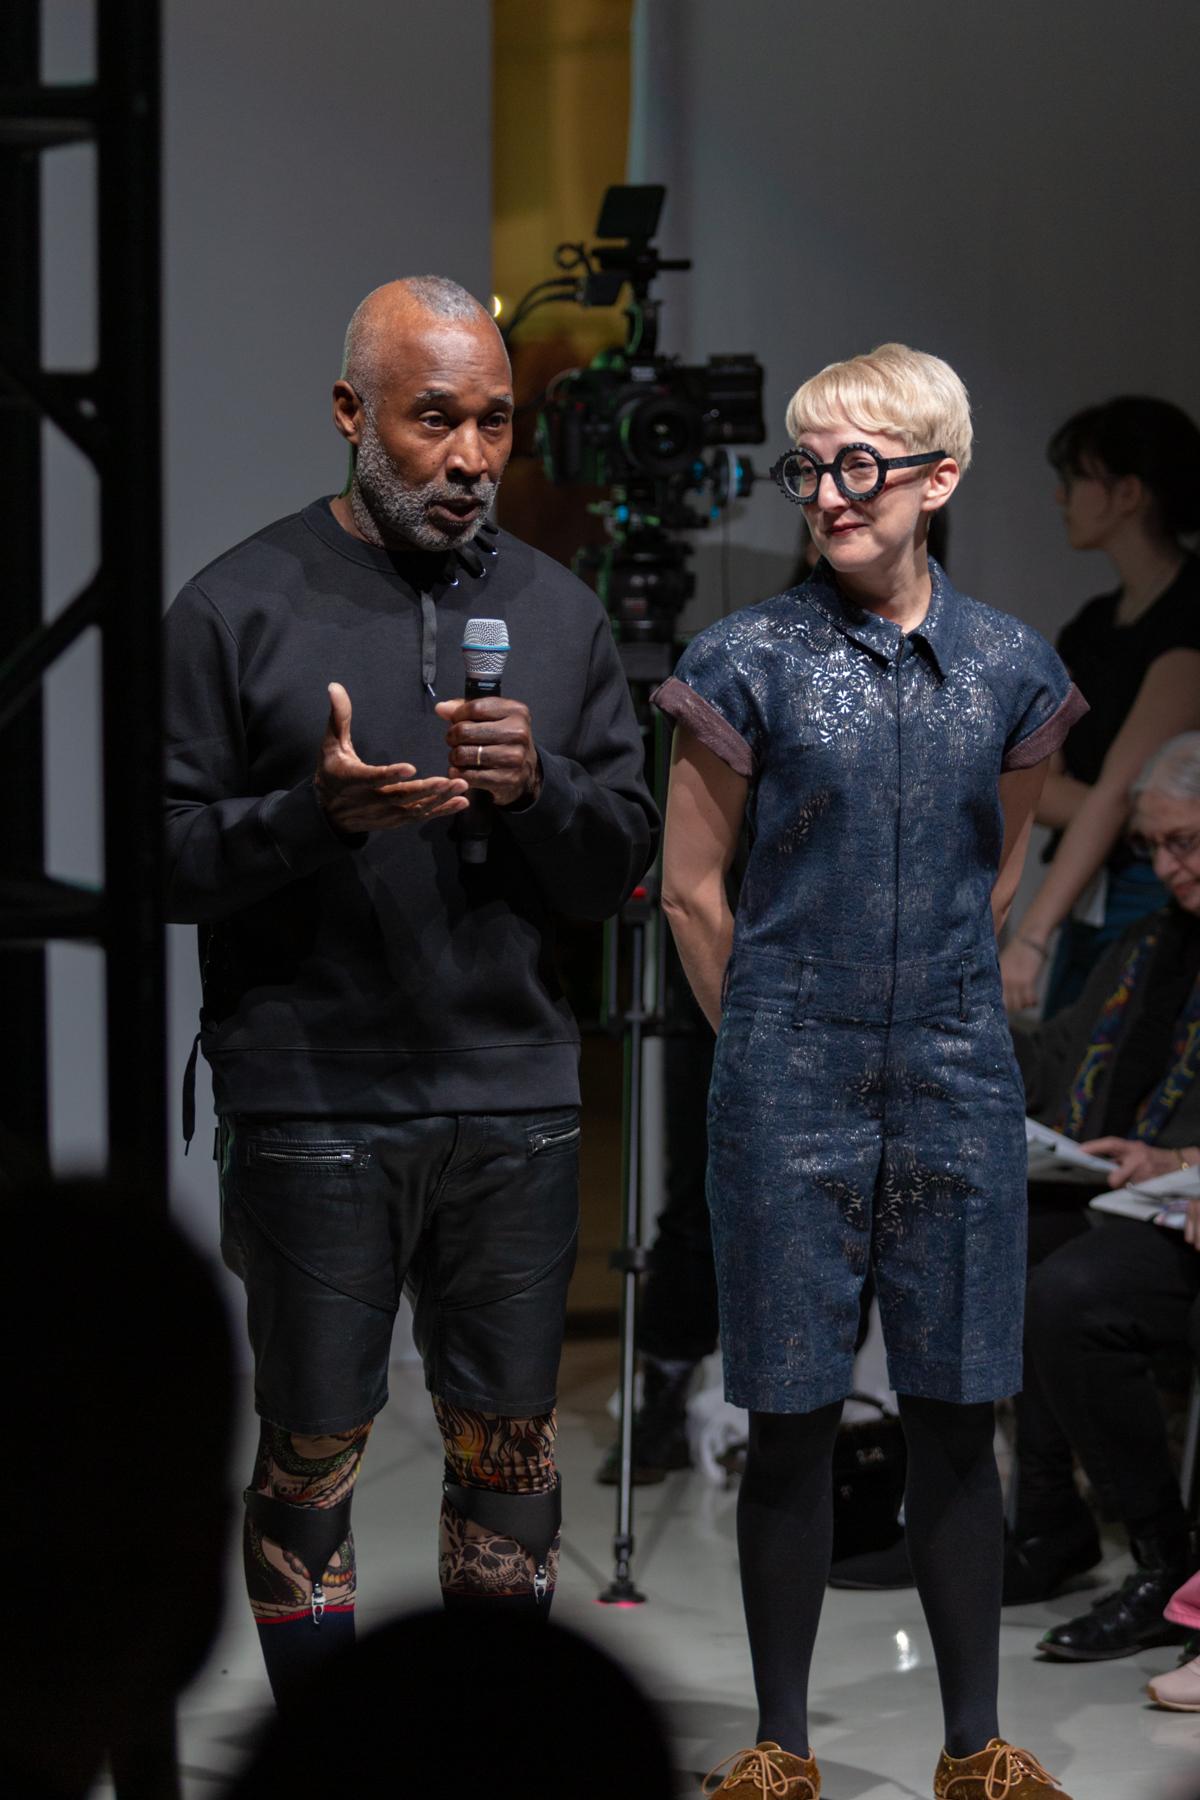 connor_fenwick_saic_fashion_event_01.jpg